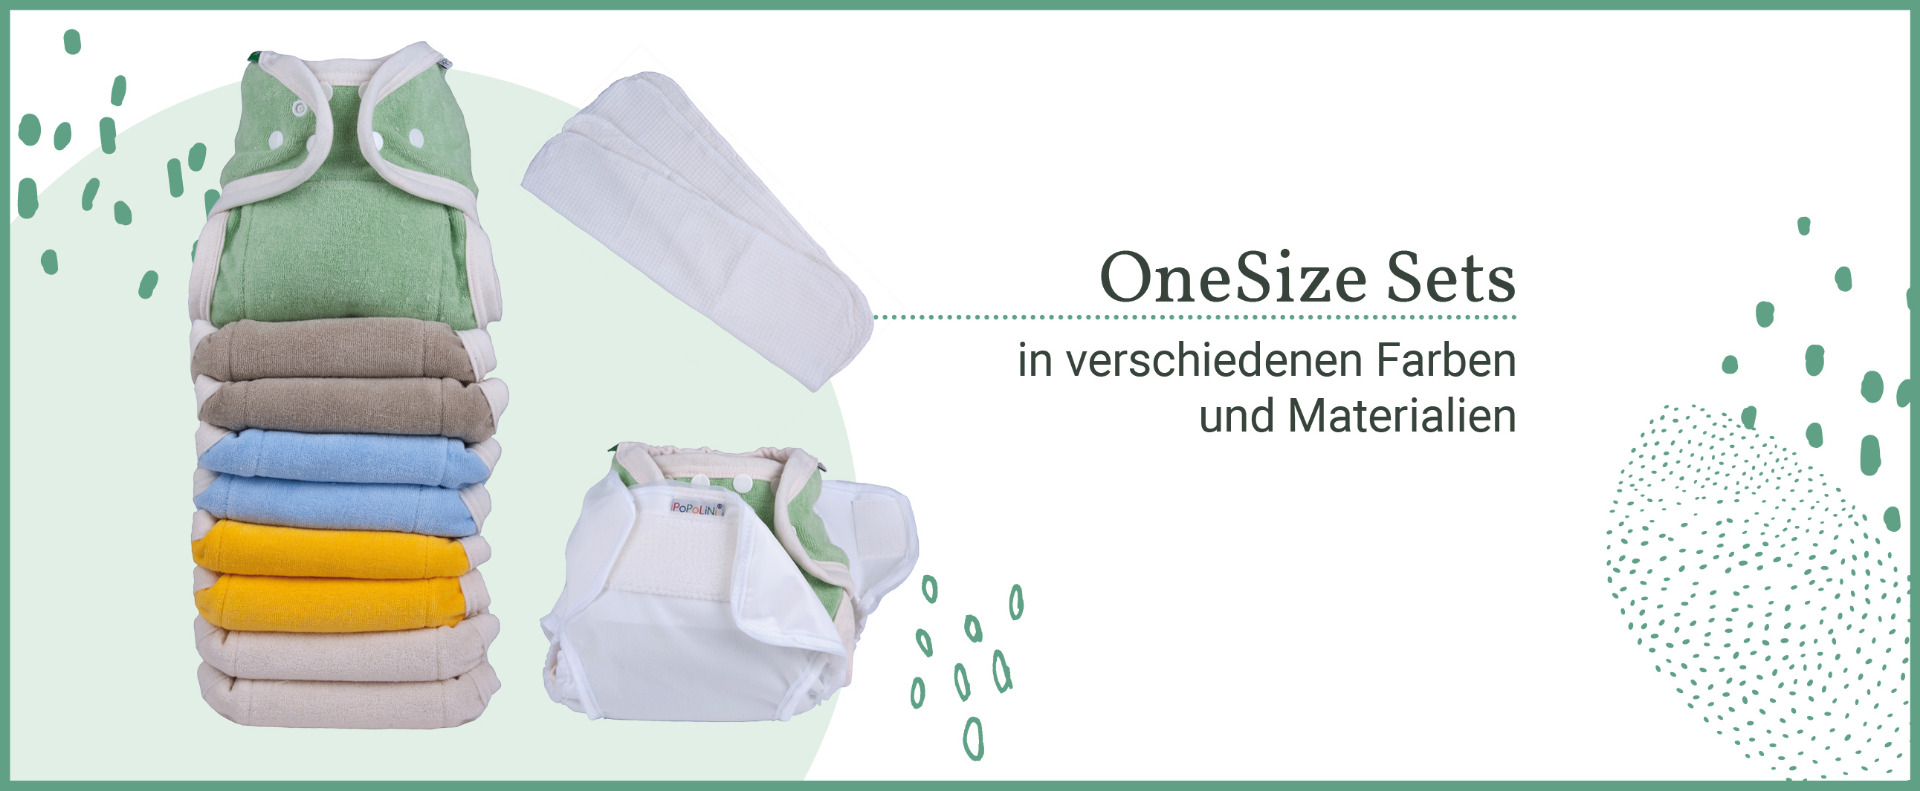 popolini OneSize sets